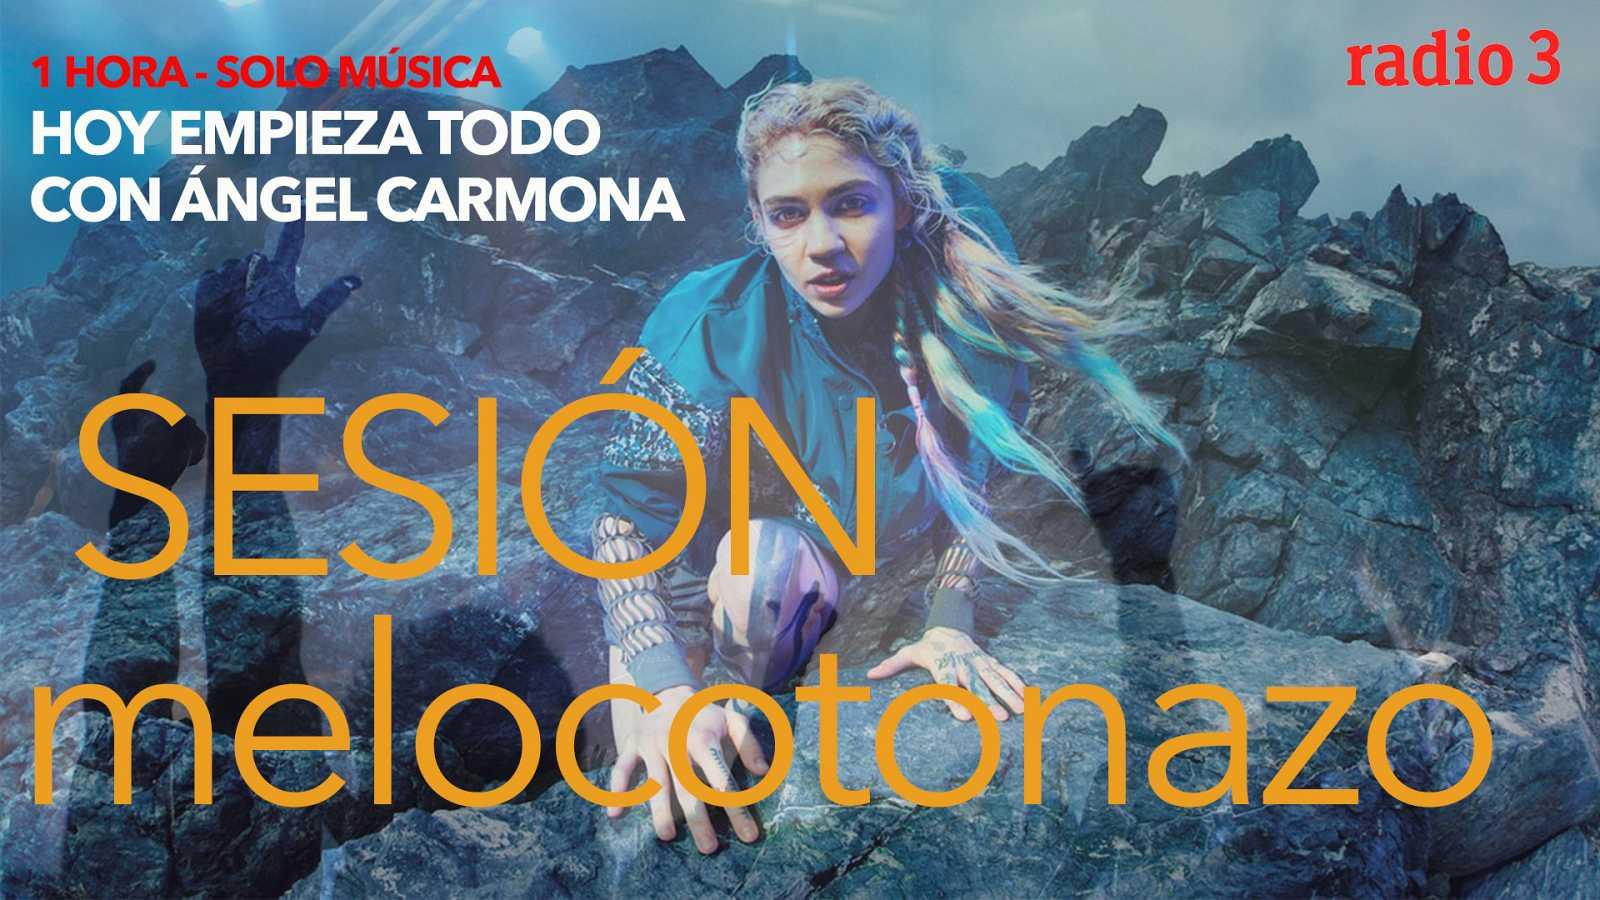 Hoy empieza todo con Ángel Carmona - #SesiónMelocotonazo: Arcade Fire, Grimes, Bjork... - 14/04/21 - escuchar ahora